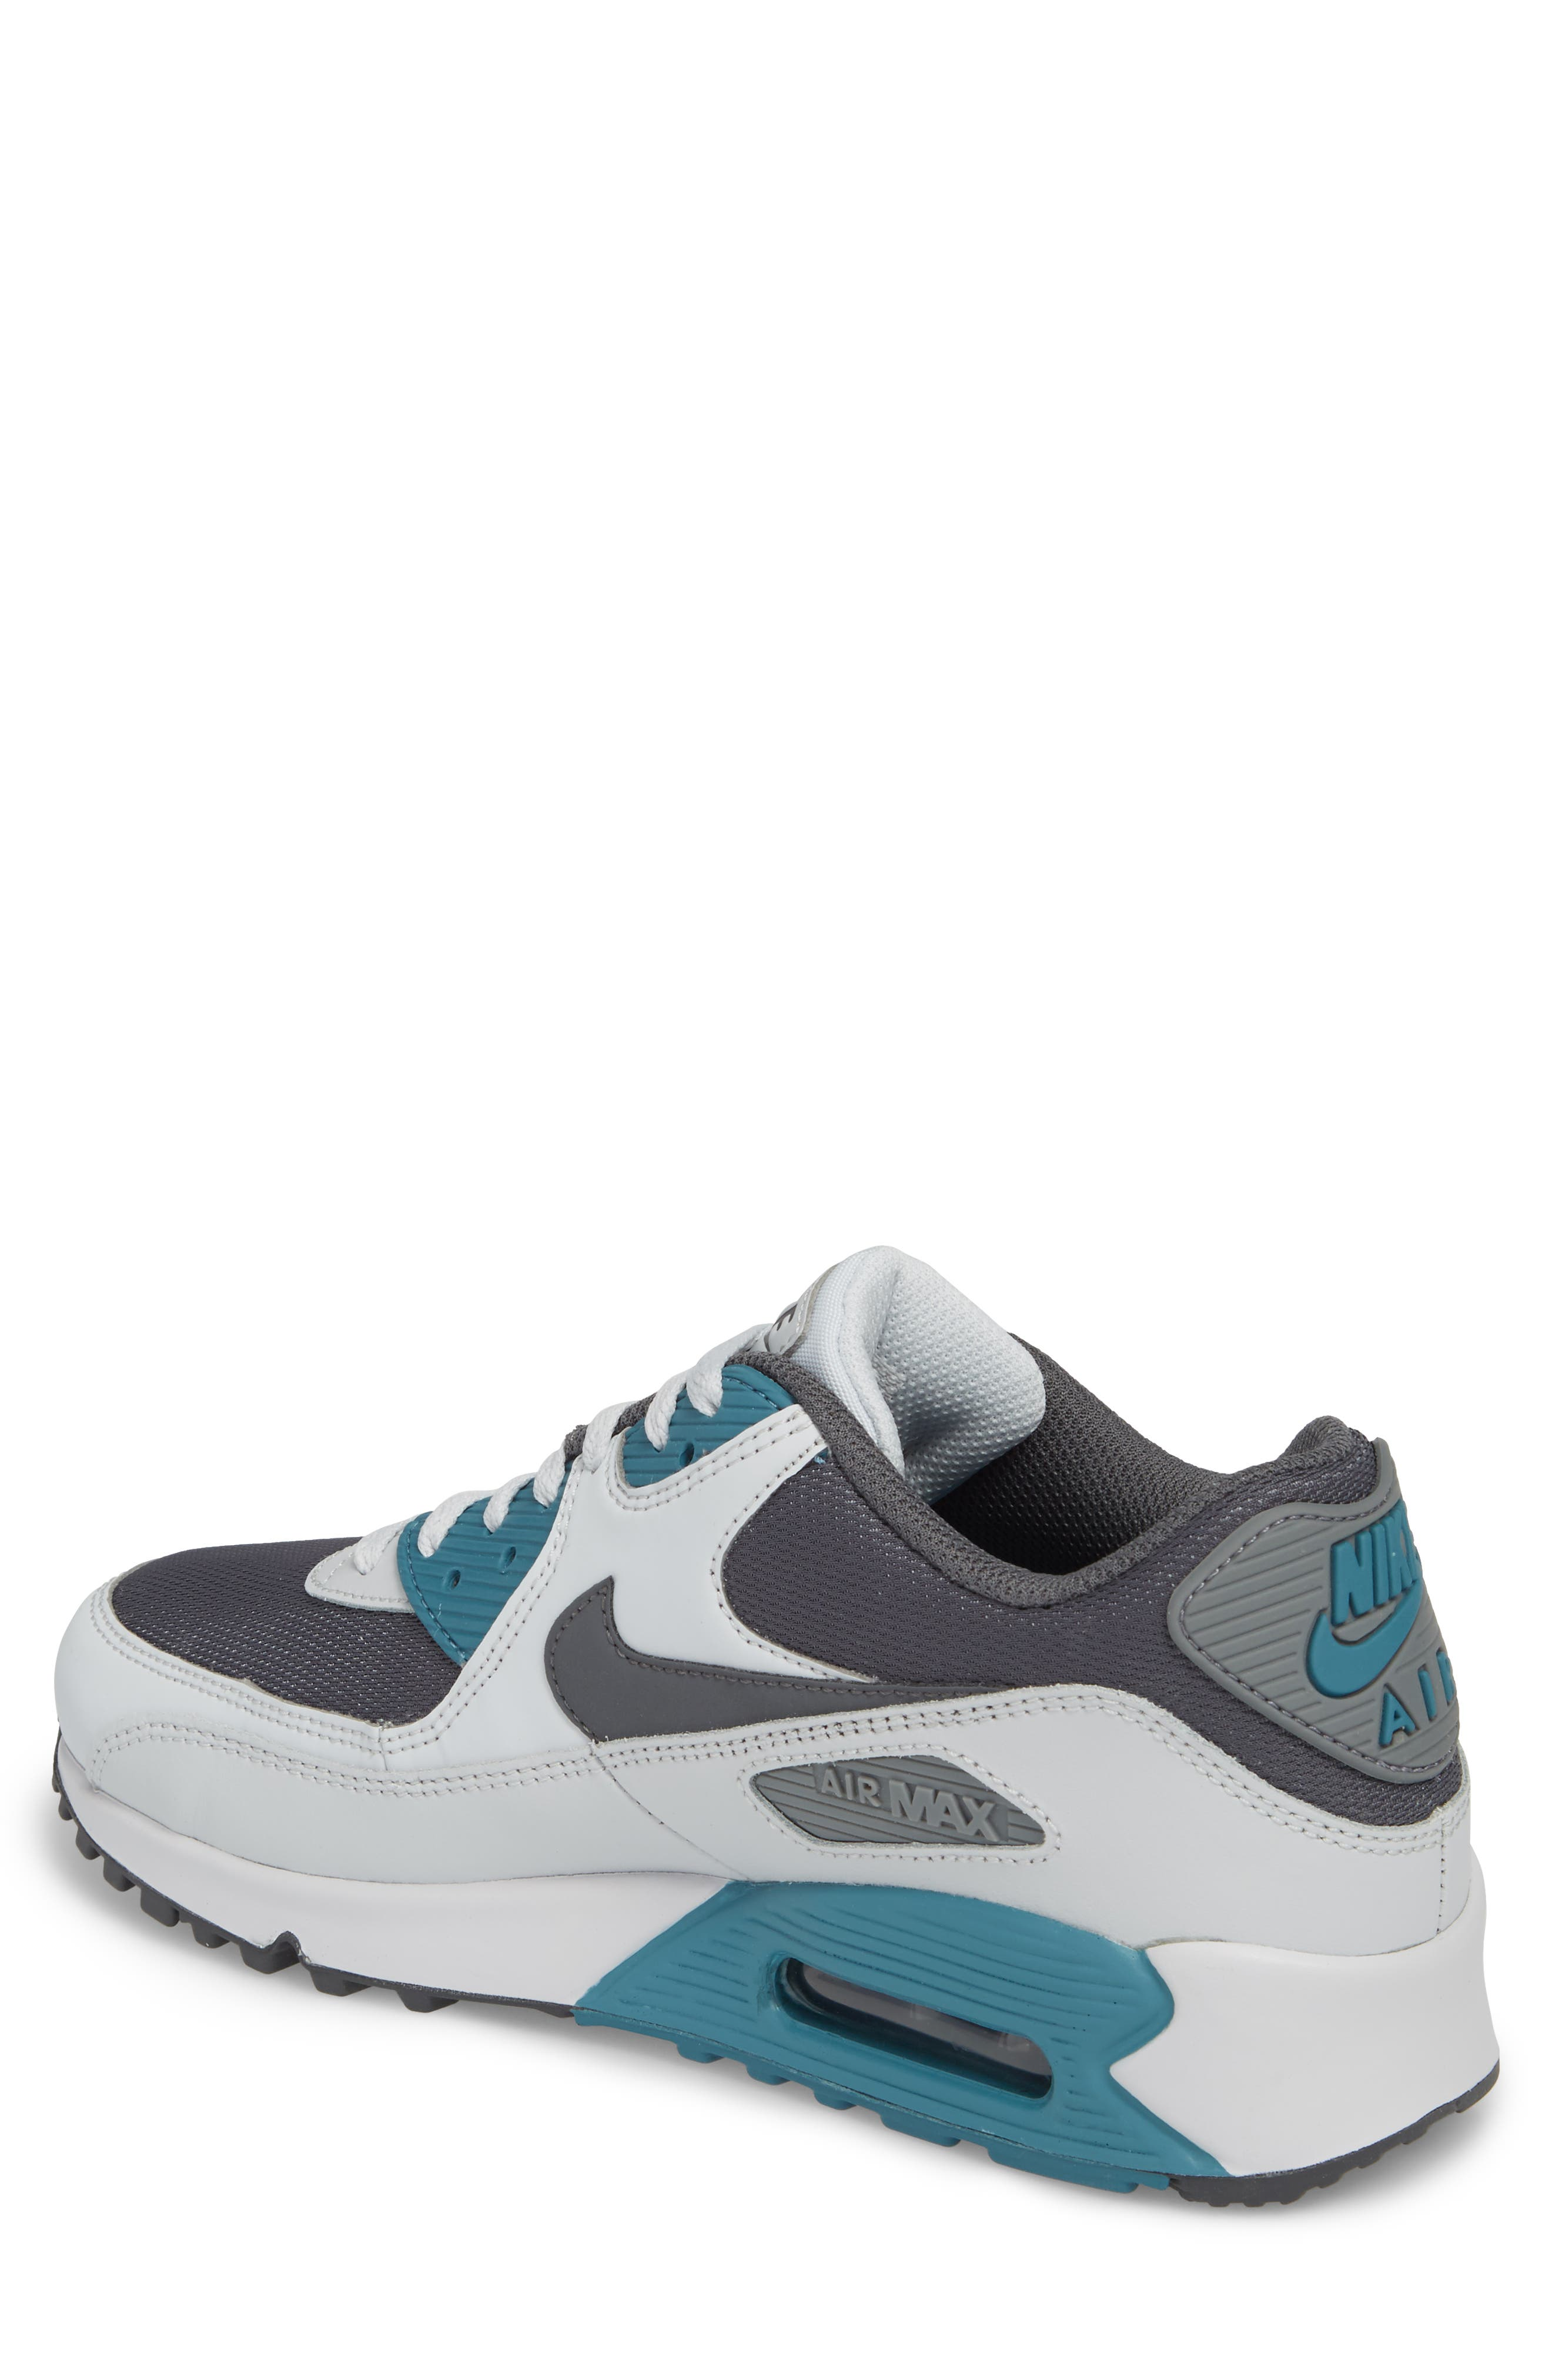 'Air Max 90 Essential' Sneaker,                             Alternate thumbnail 2, color,                             Pure Platinum/ Cool Grey/ Aqua